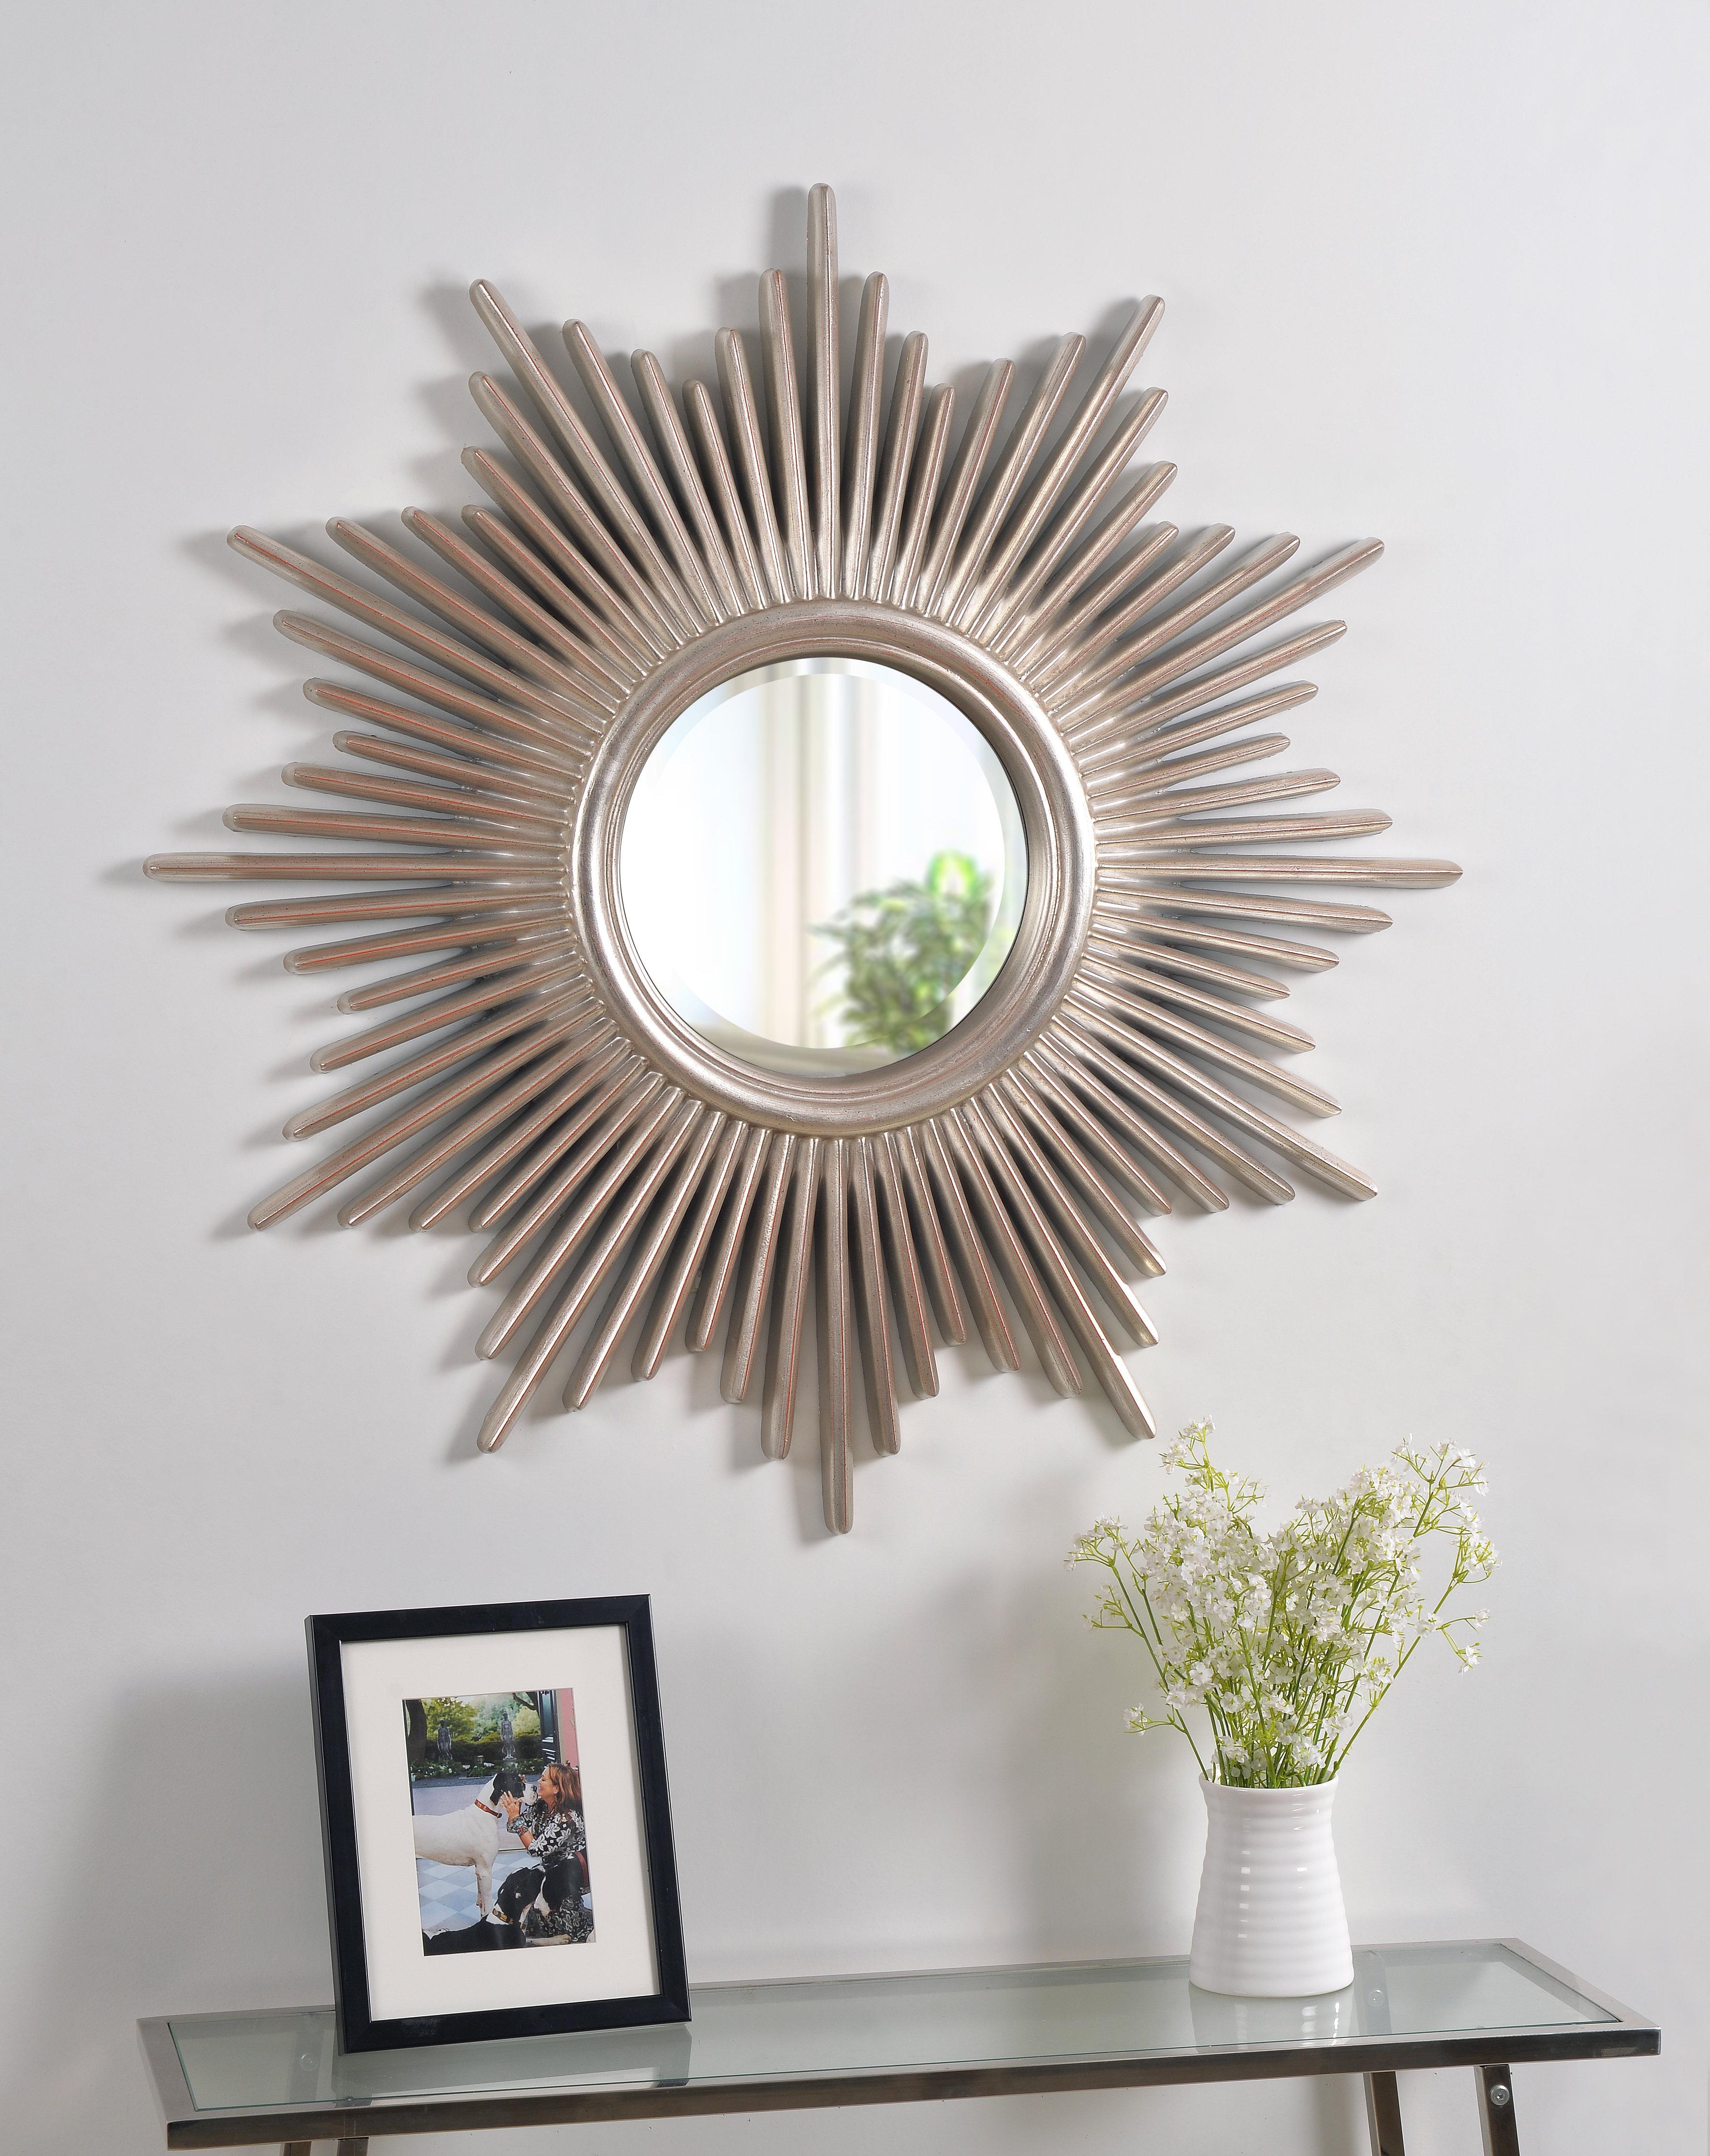 Willa Arlo Interiors Josephson Starburst Glam Beveled Accent Wall Mirror With Starburst Wall Decor By Willa Arlo Interiors (View 7 of 30)